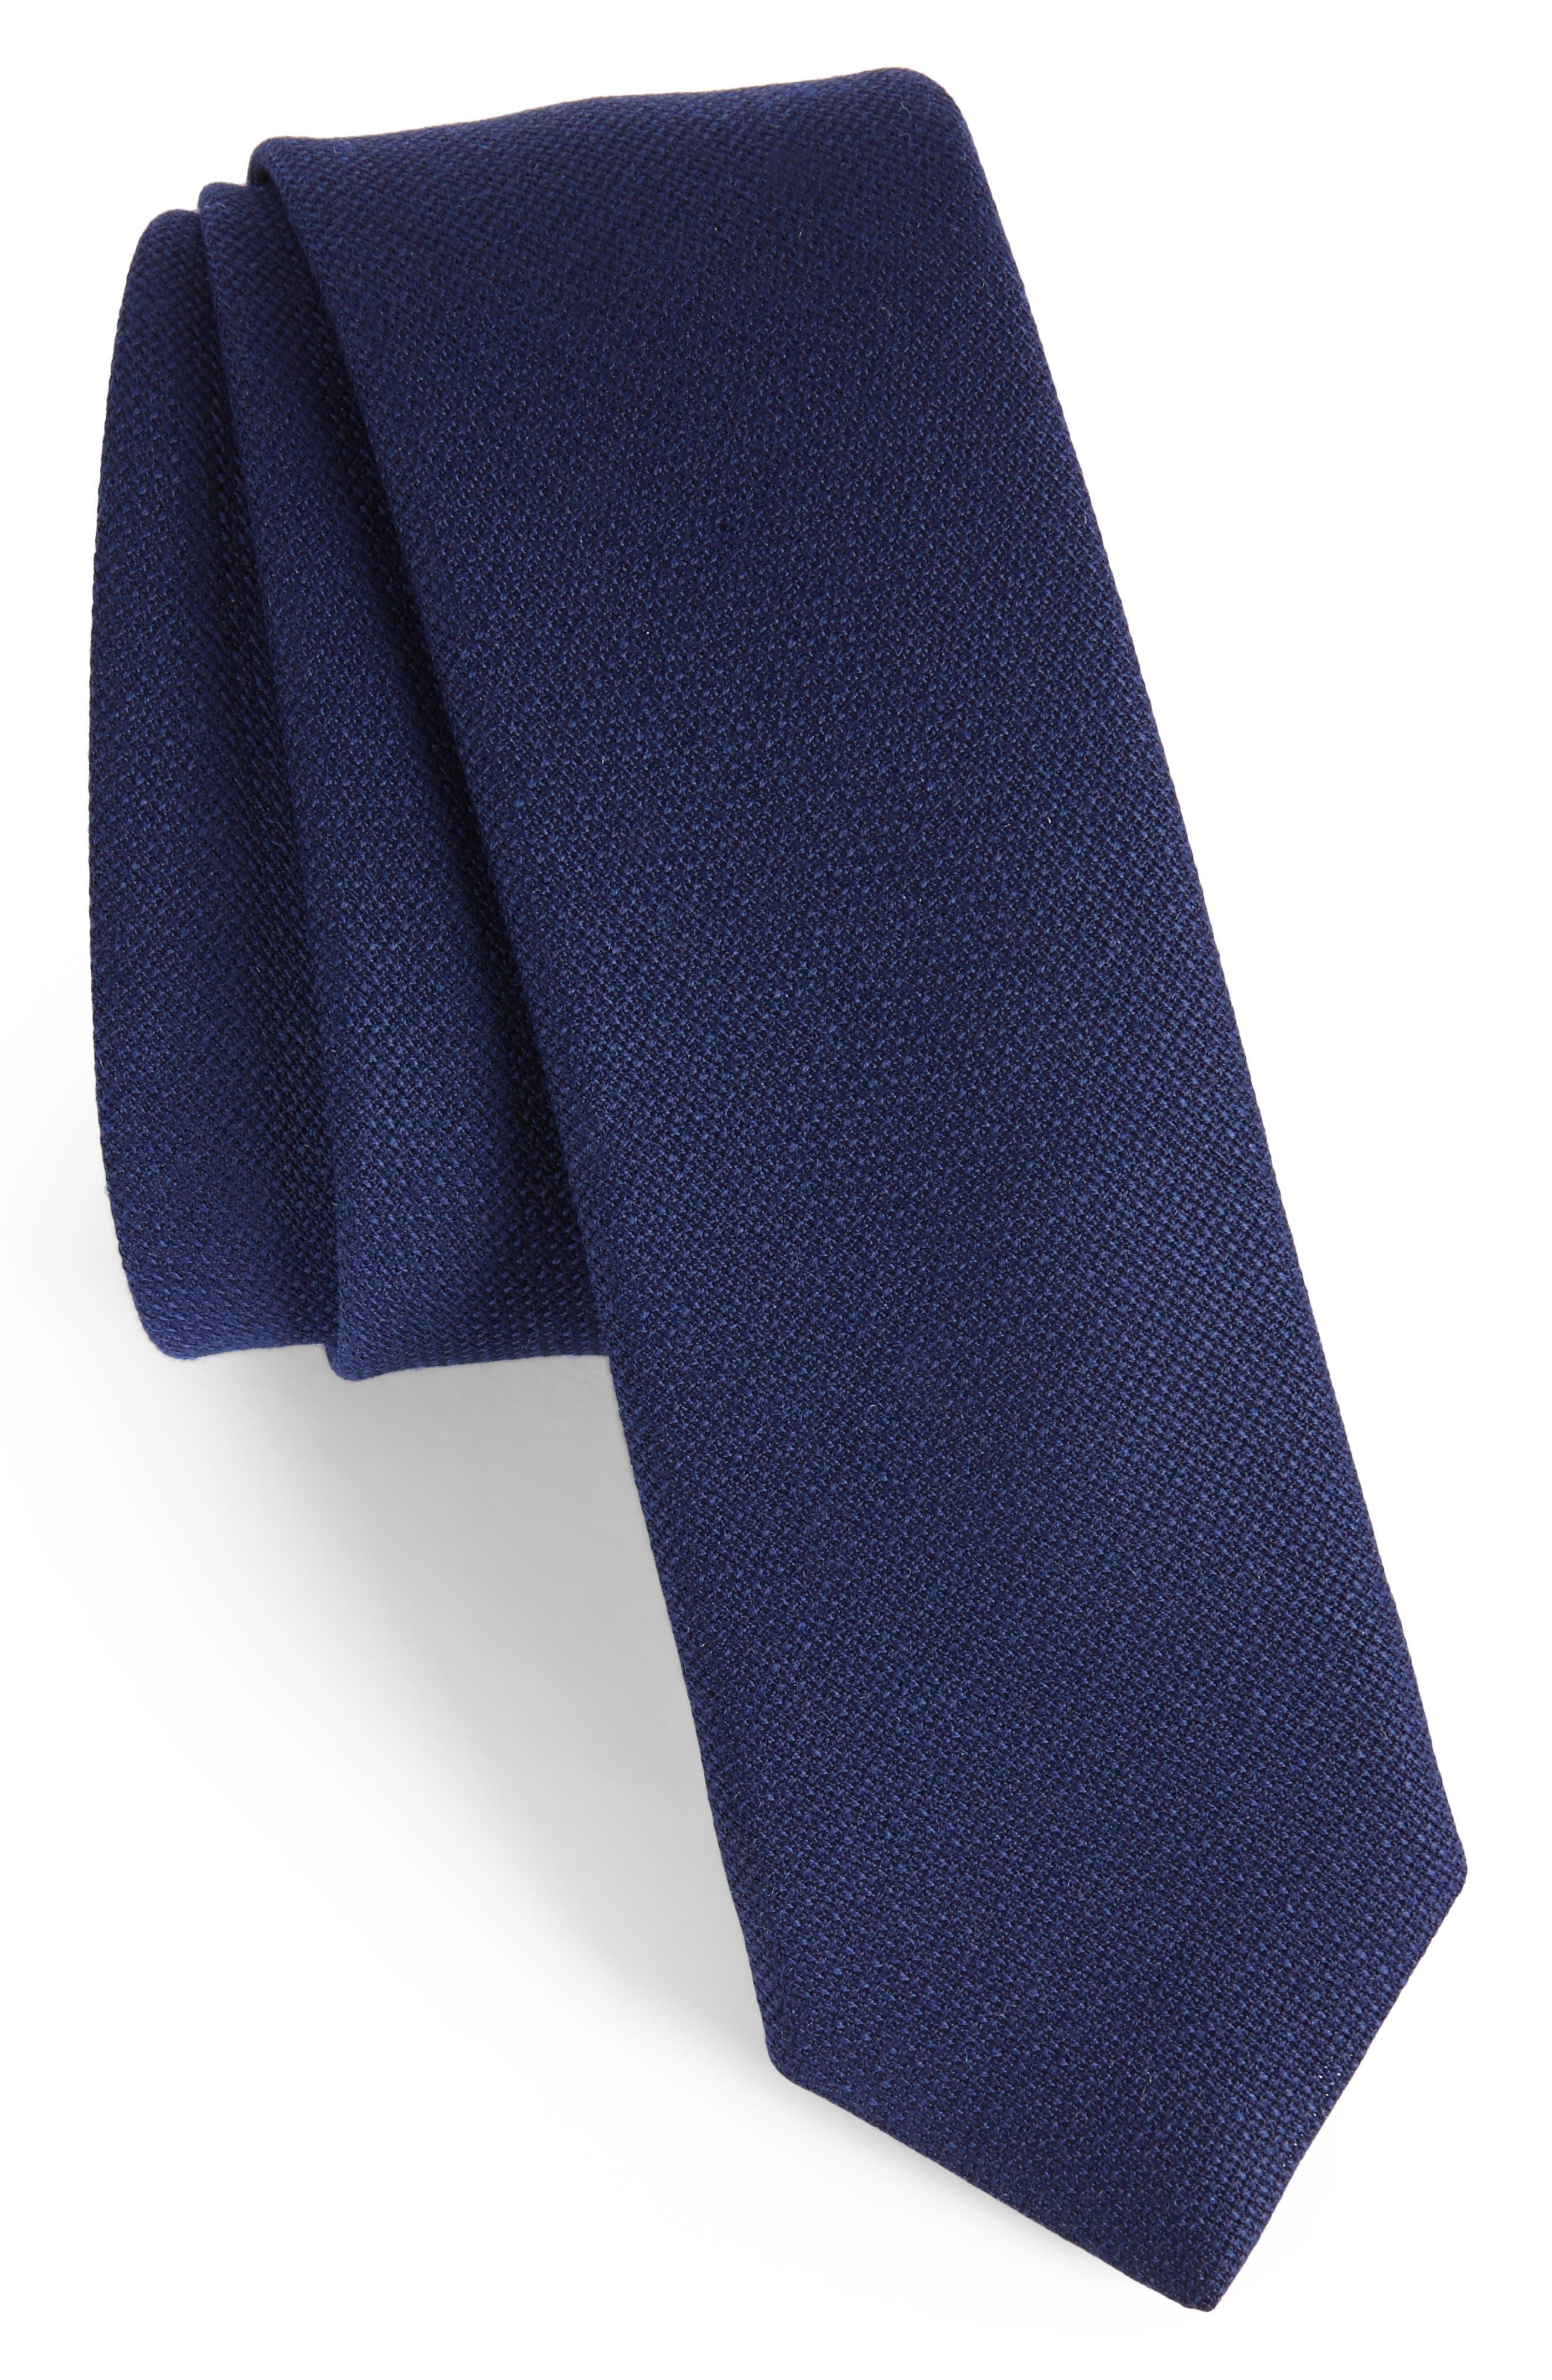 Marled Wool Skinny Tie,                             Main thumbnail 1, color,                             410